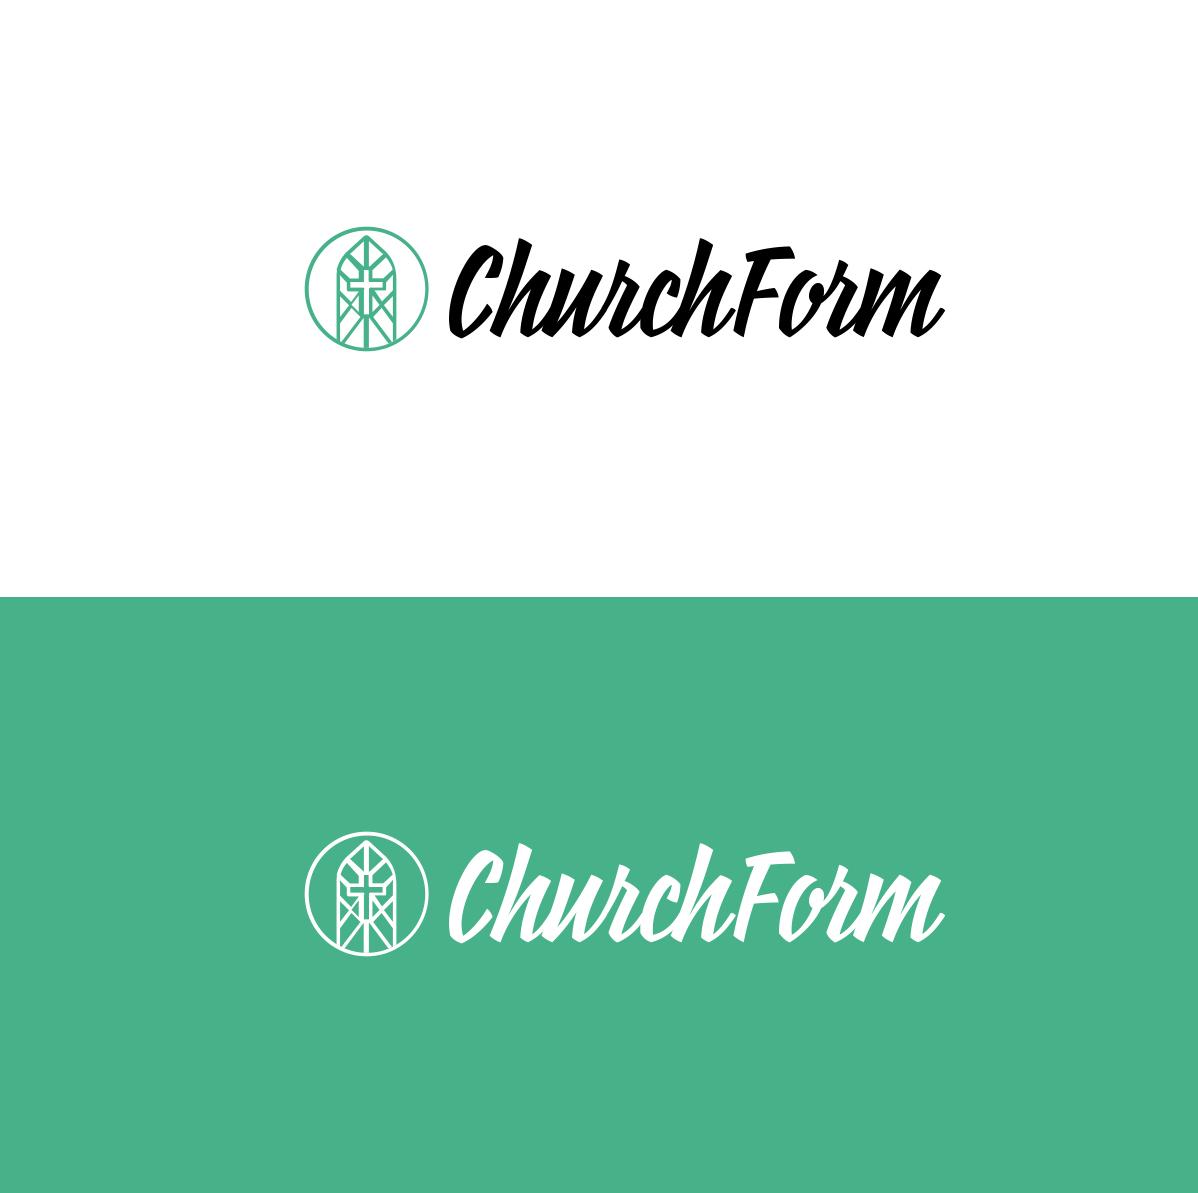 ChurchForm — Logo